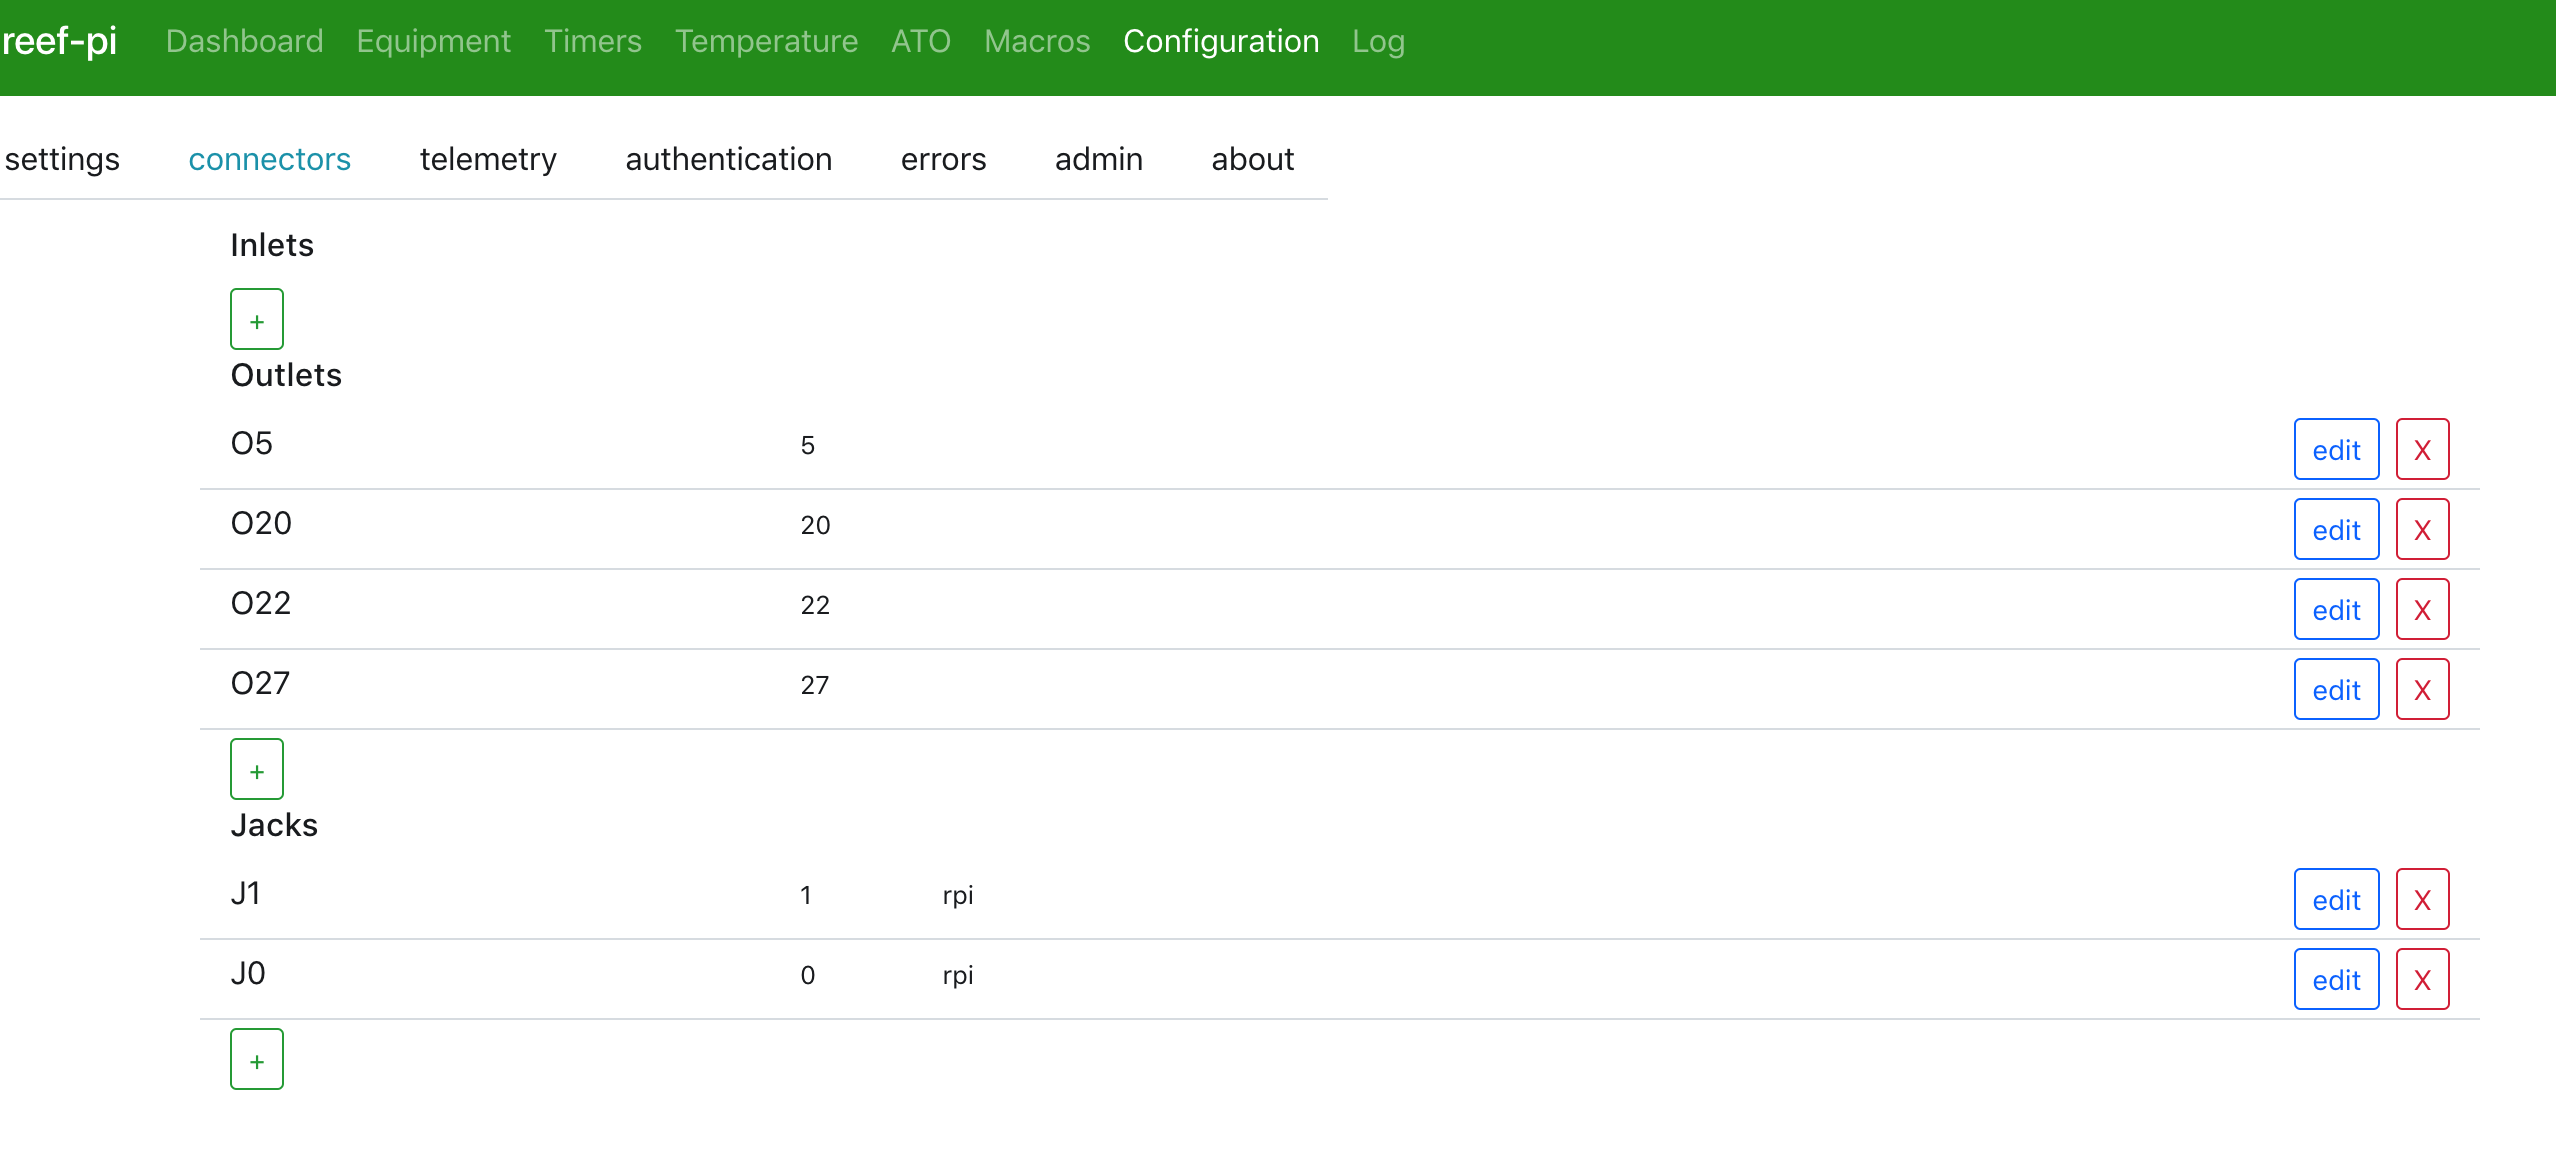 components_Screen_Shot_2018-11-17_at_2.43.48_AM.png